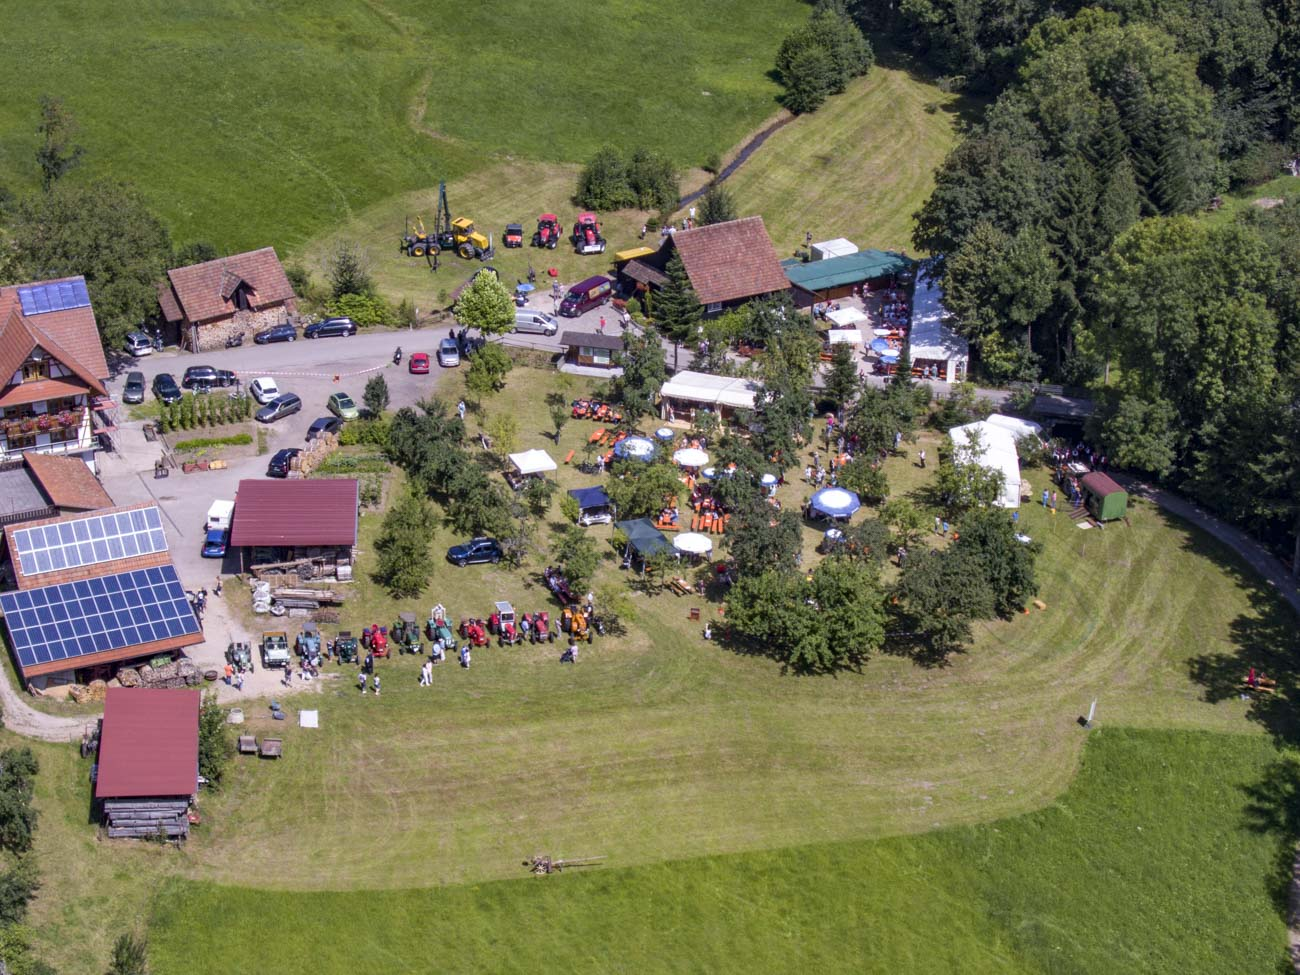 Mühlenfest Seebach